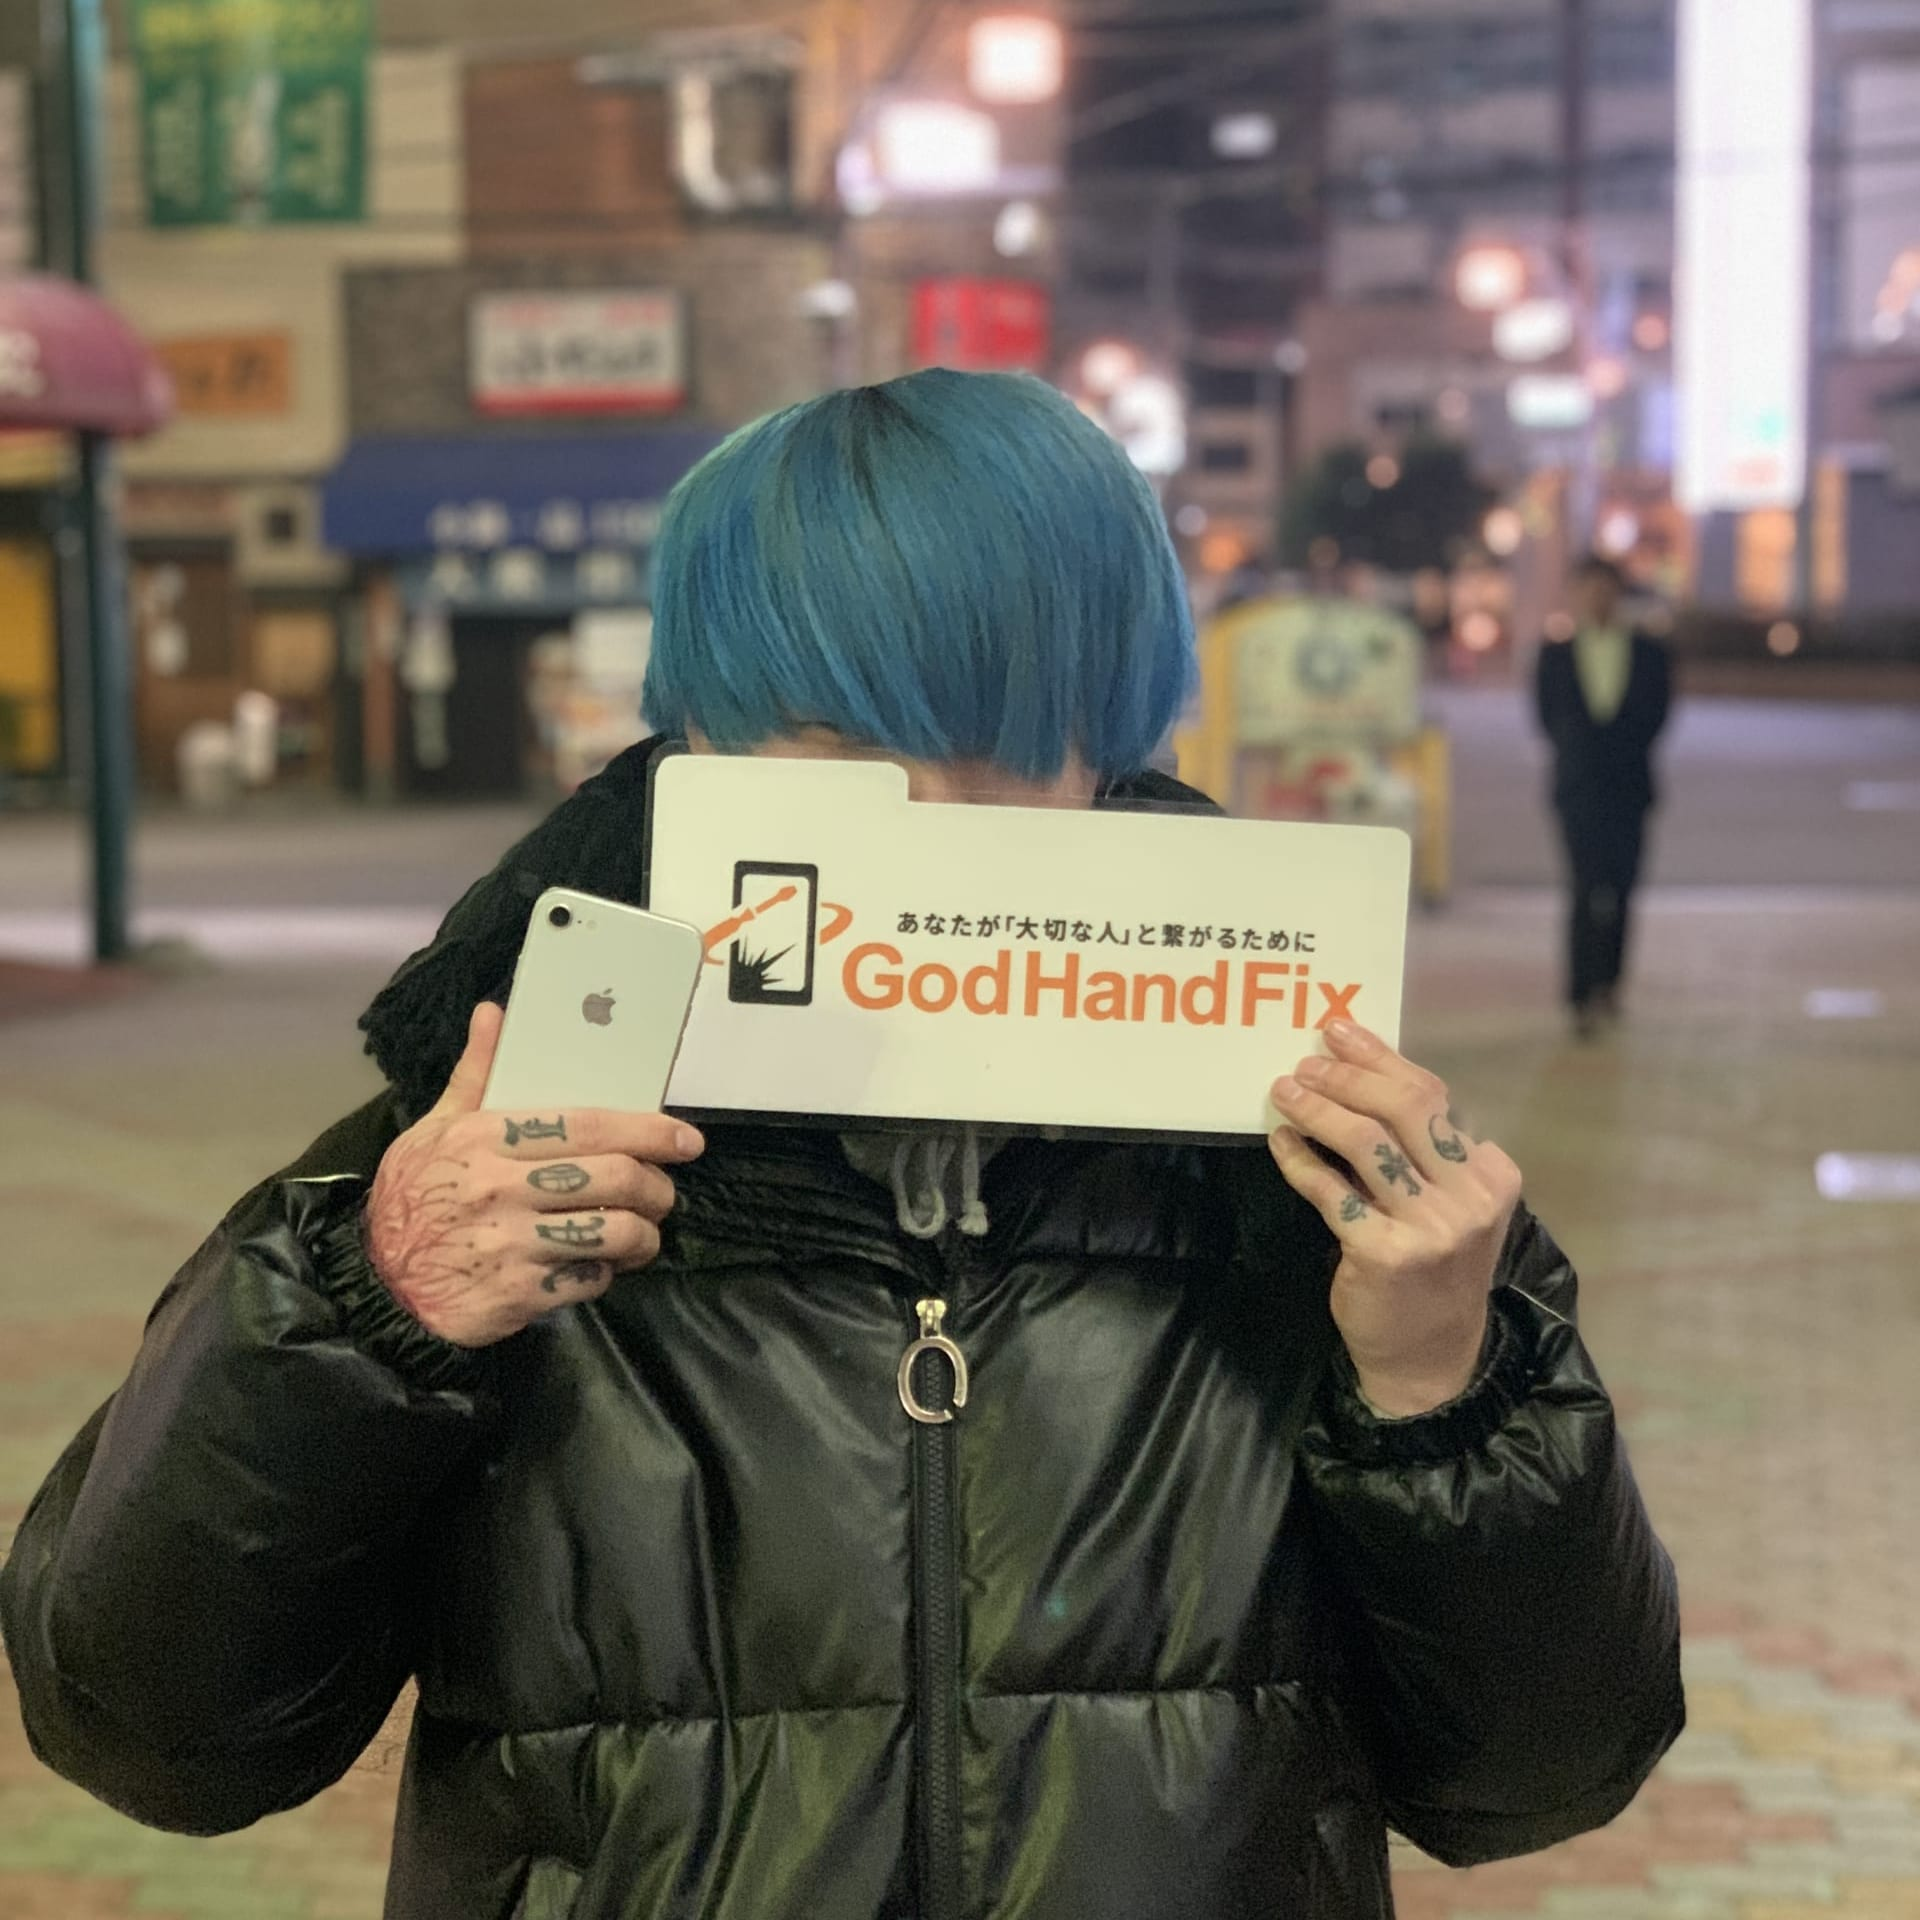 GodHandFixは、他社とココが違う!!